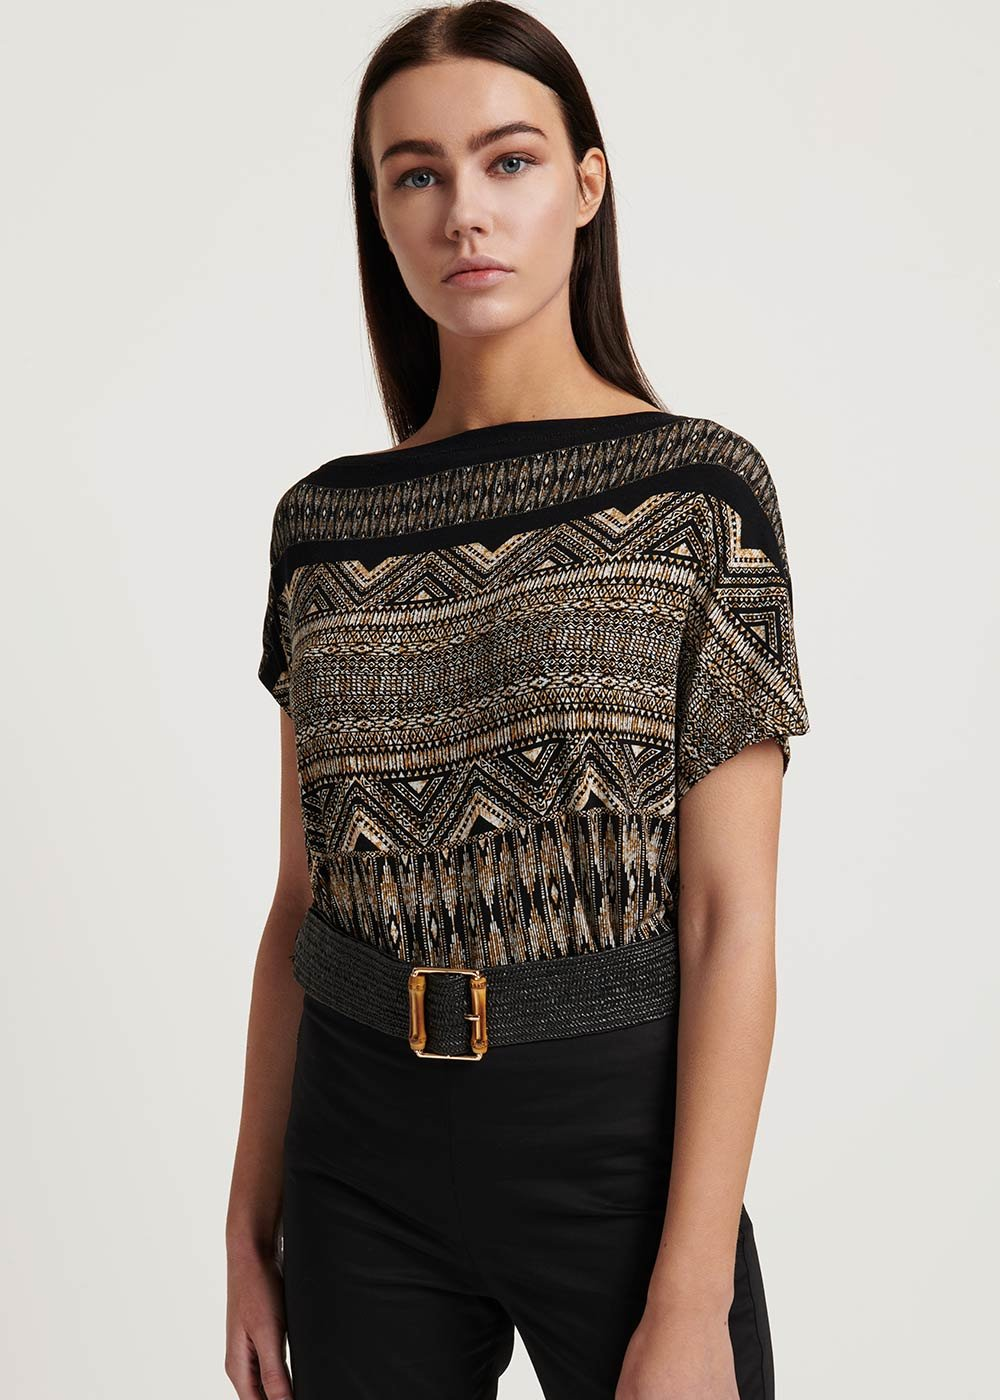 Shin patterned T-shirt - Black /  Cacao /  Fantasia - Woman